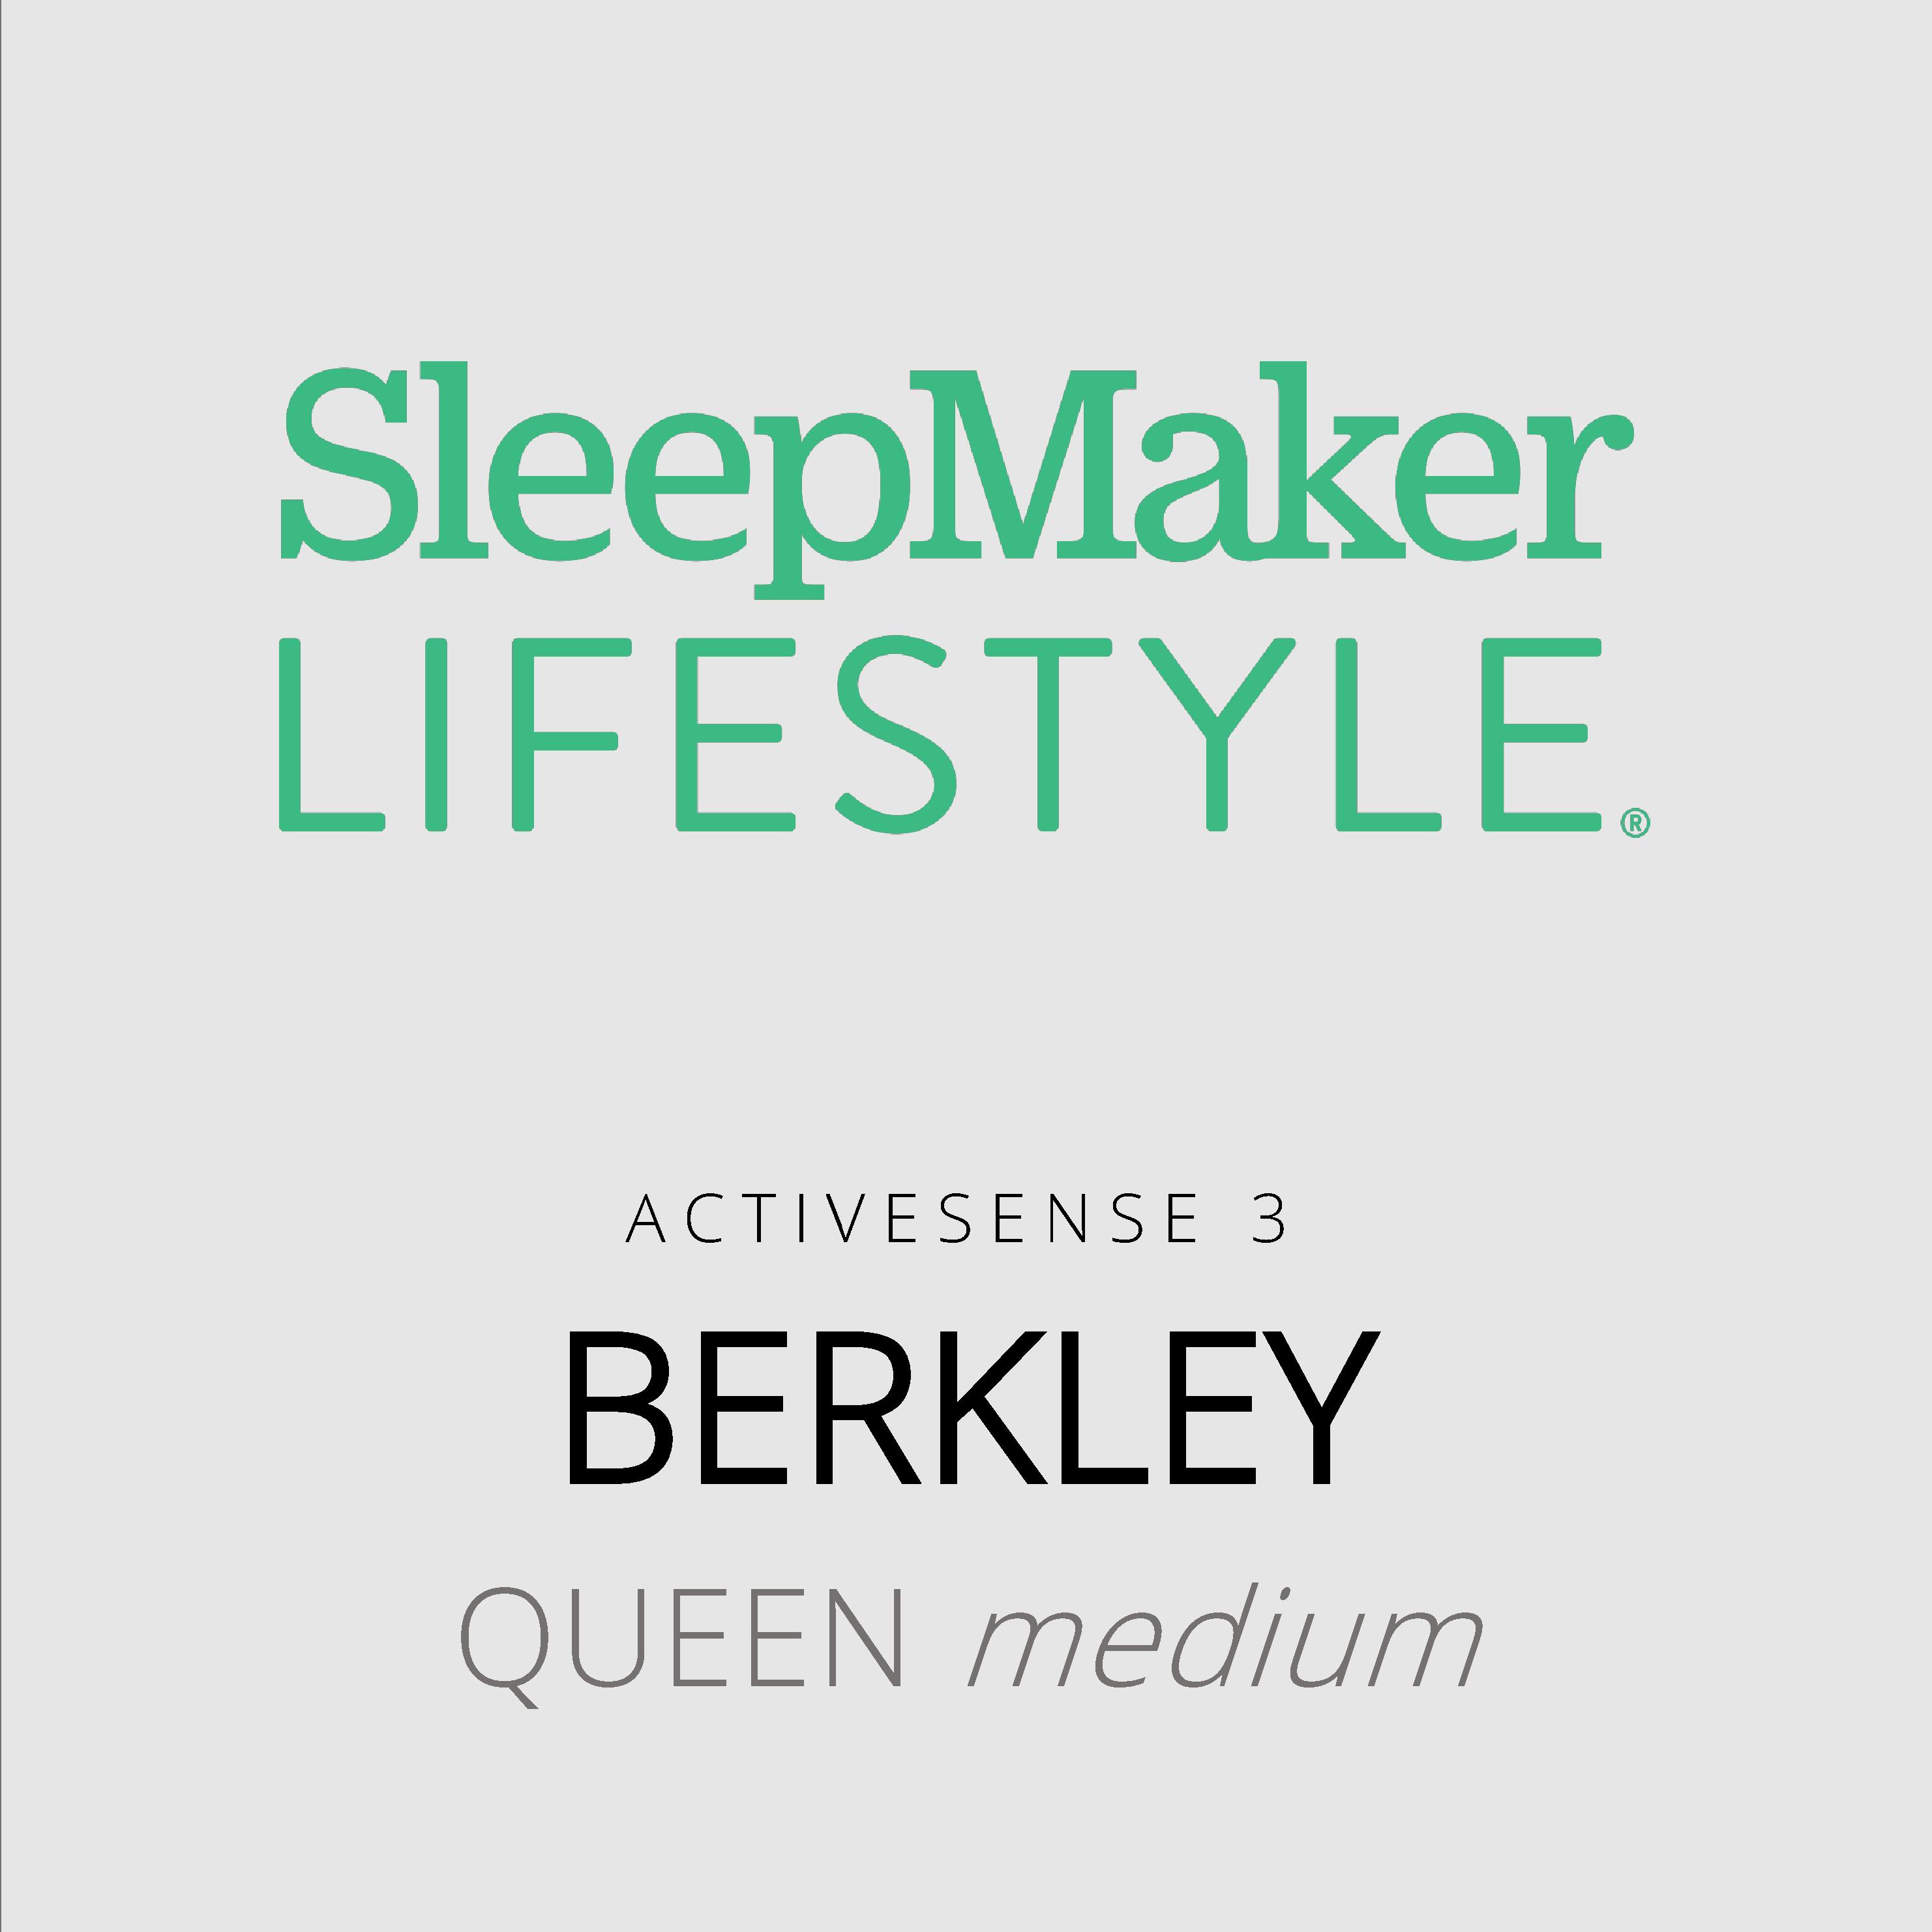 SleepMaker Lifestyle – Berkley – ActiveSense 3 – Queen Medium Mattress